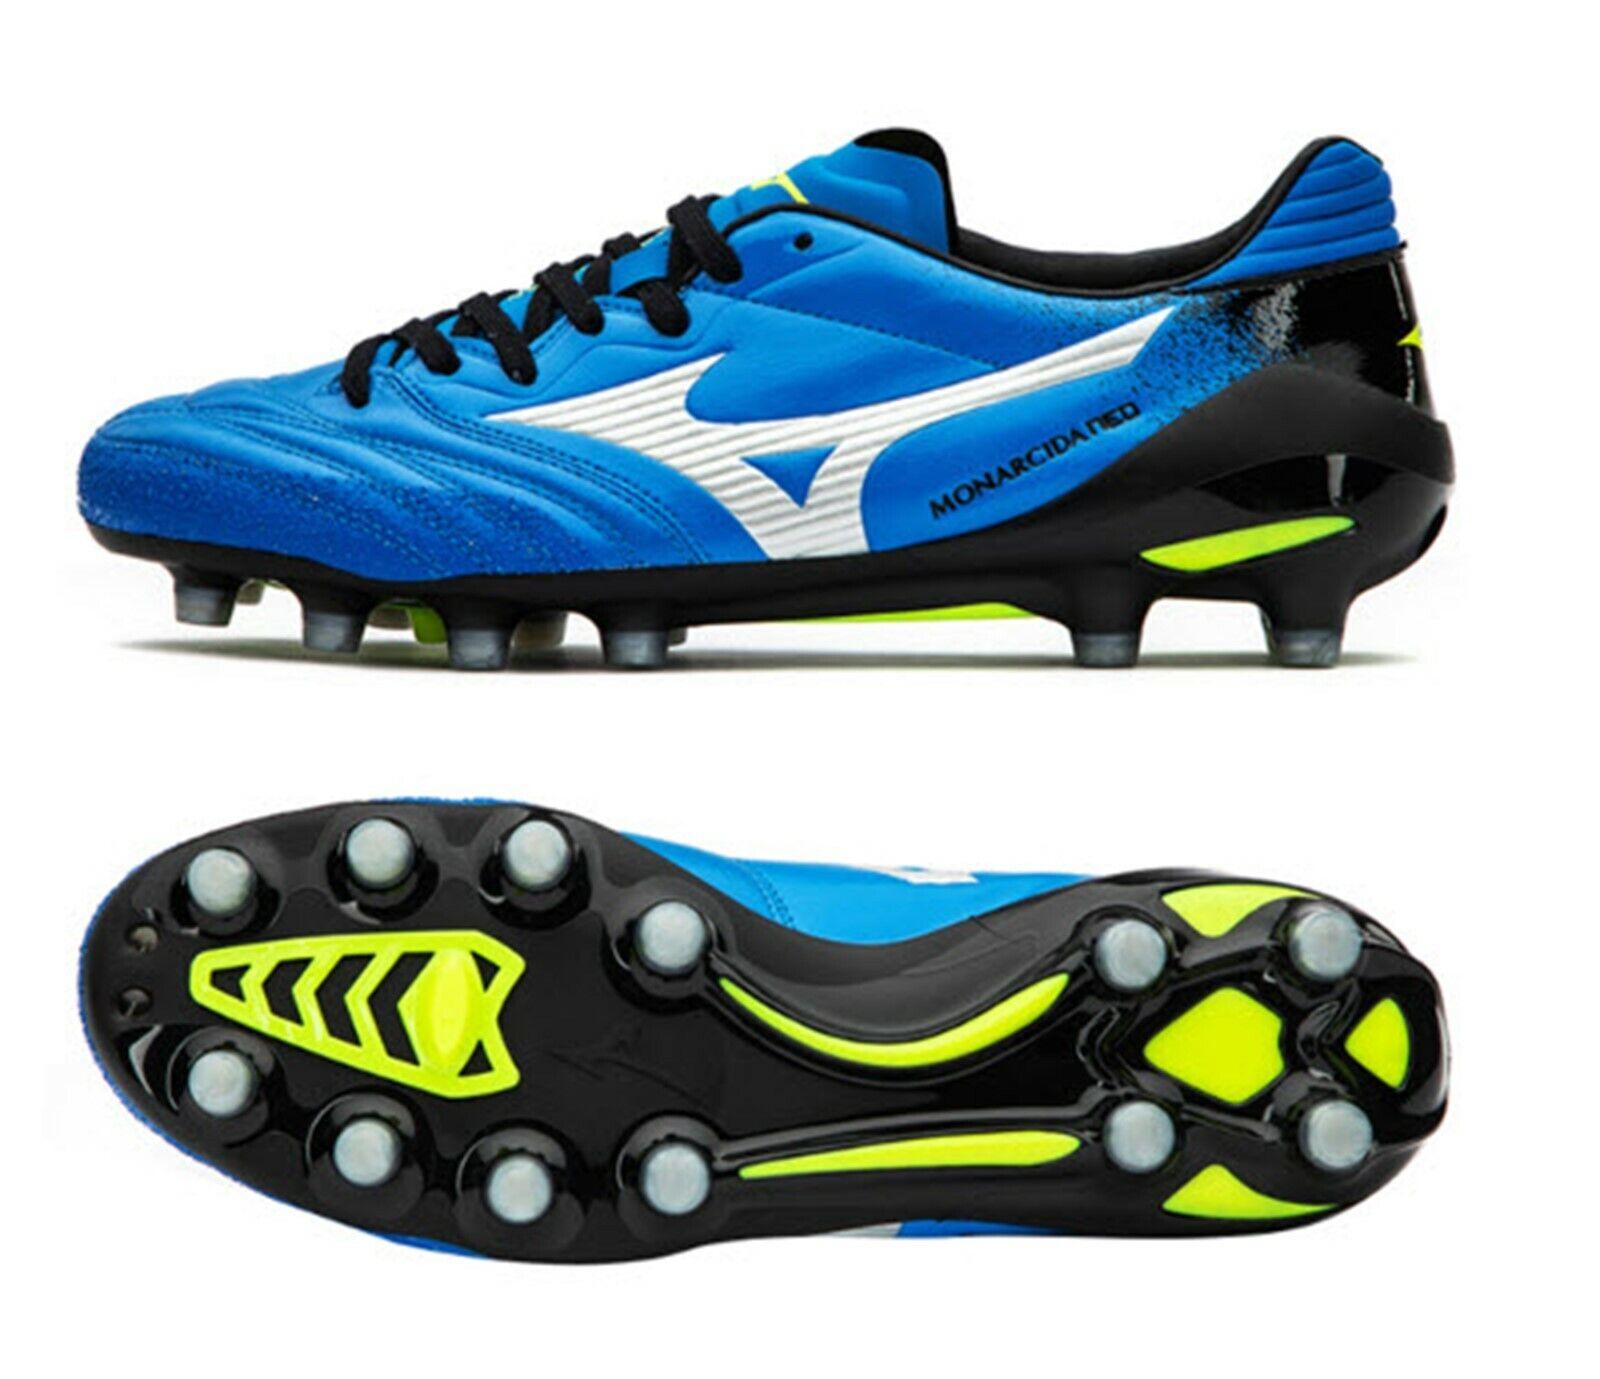 Mizuno Hommes Monarcida Neo JAPAN Cleats Soccer bleu Football Spike démarrage P1GA192027